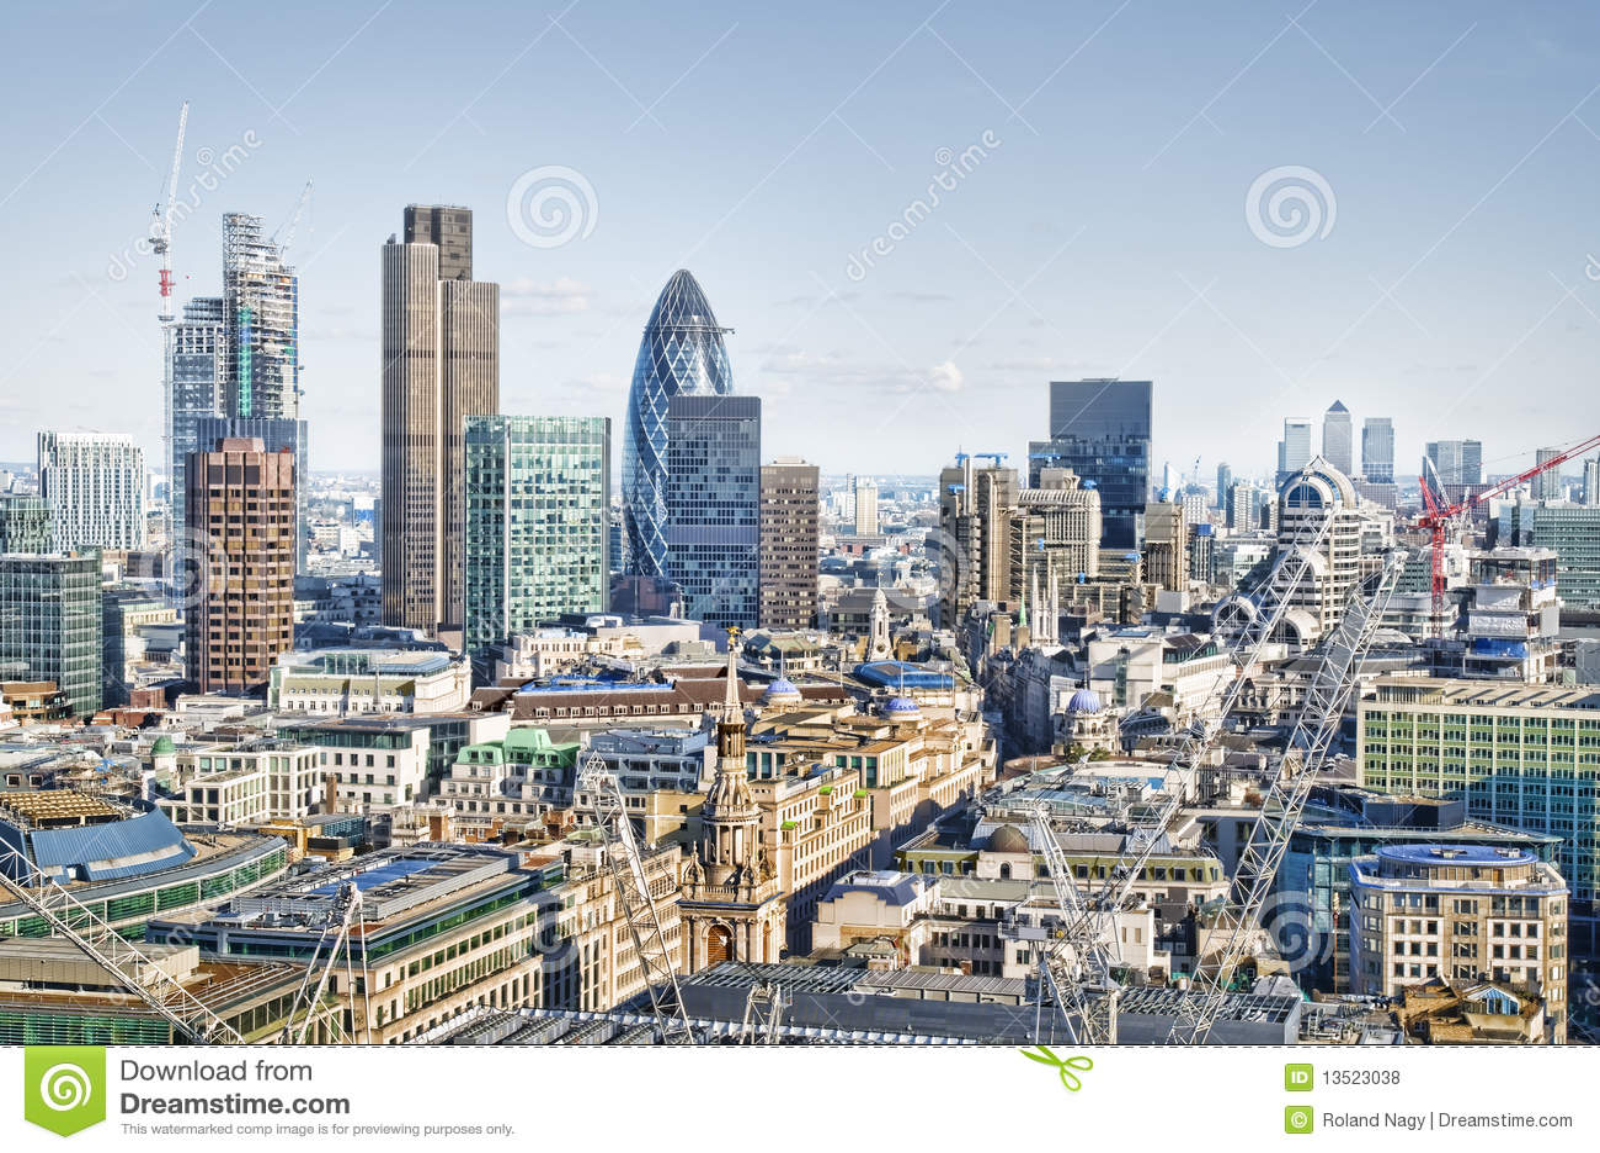 City Of London Royalty Free Stock Photos Image 13523038